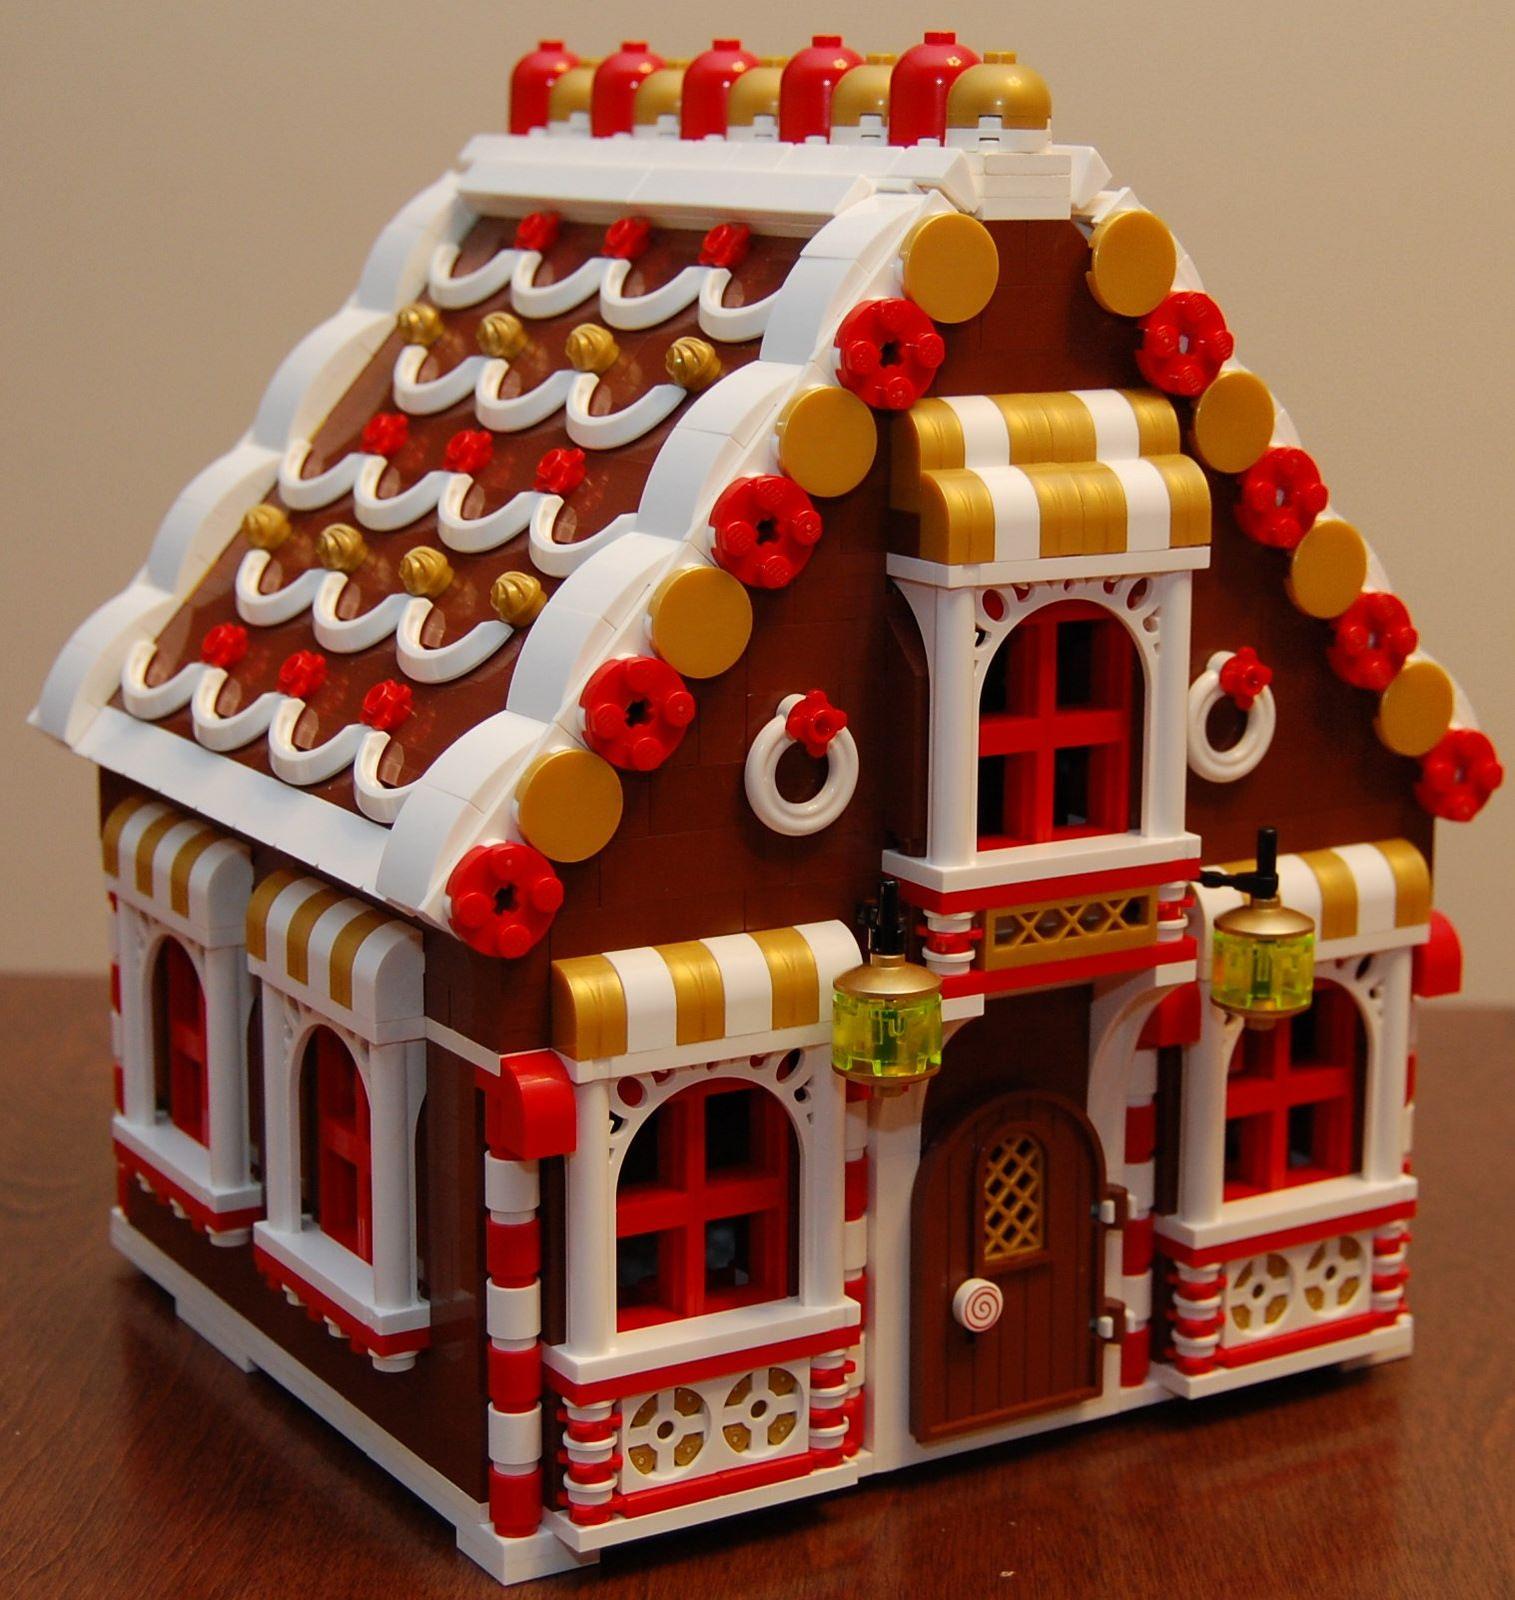 Lego gingerbread house Lego gingerbread house, Lego